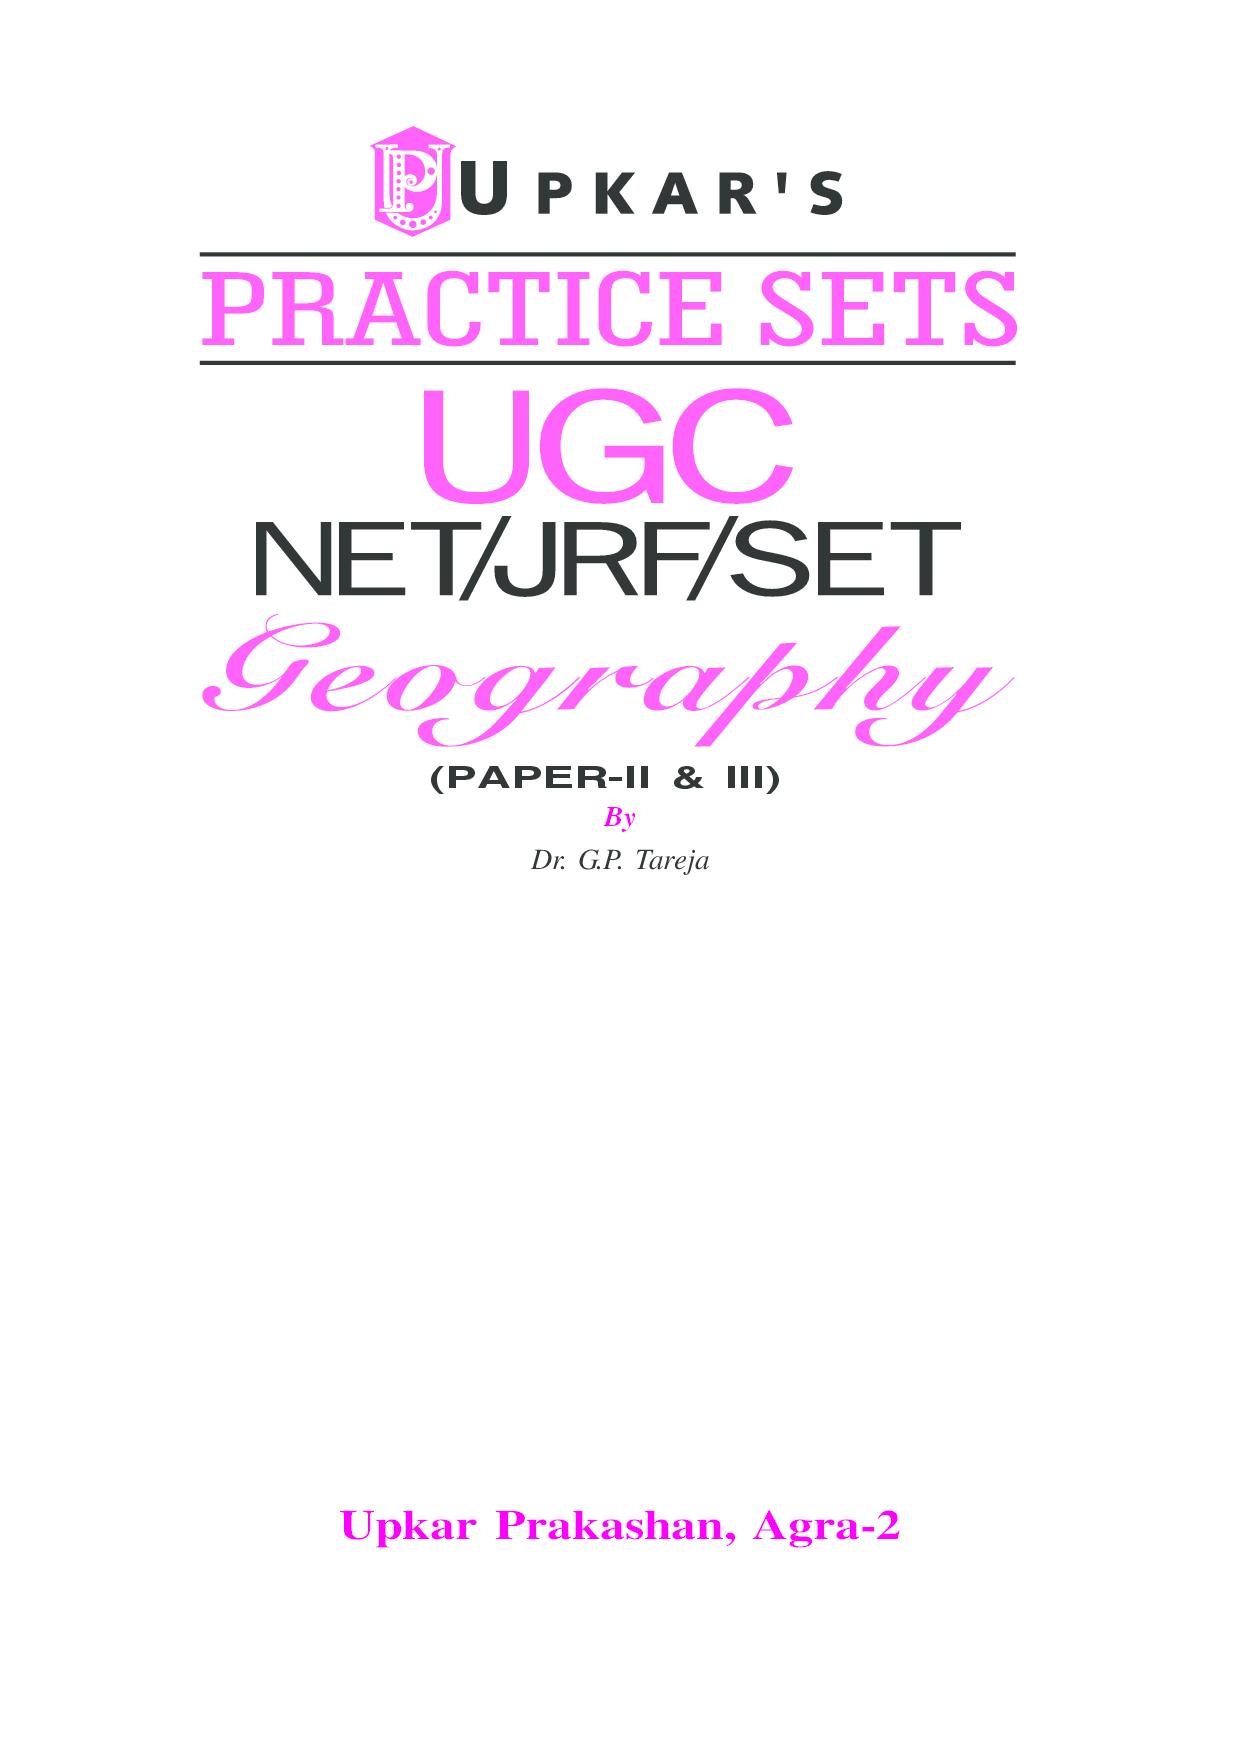 Practice Sets UGC NET/JRF/SET Geography Paper- II & III  - Page 2